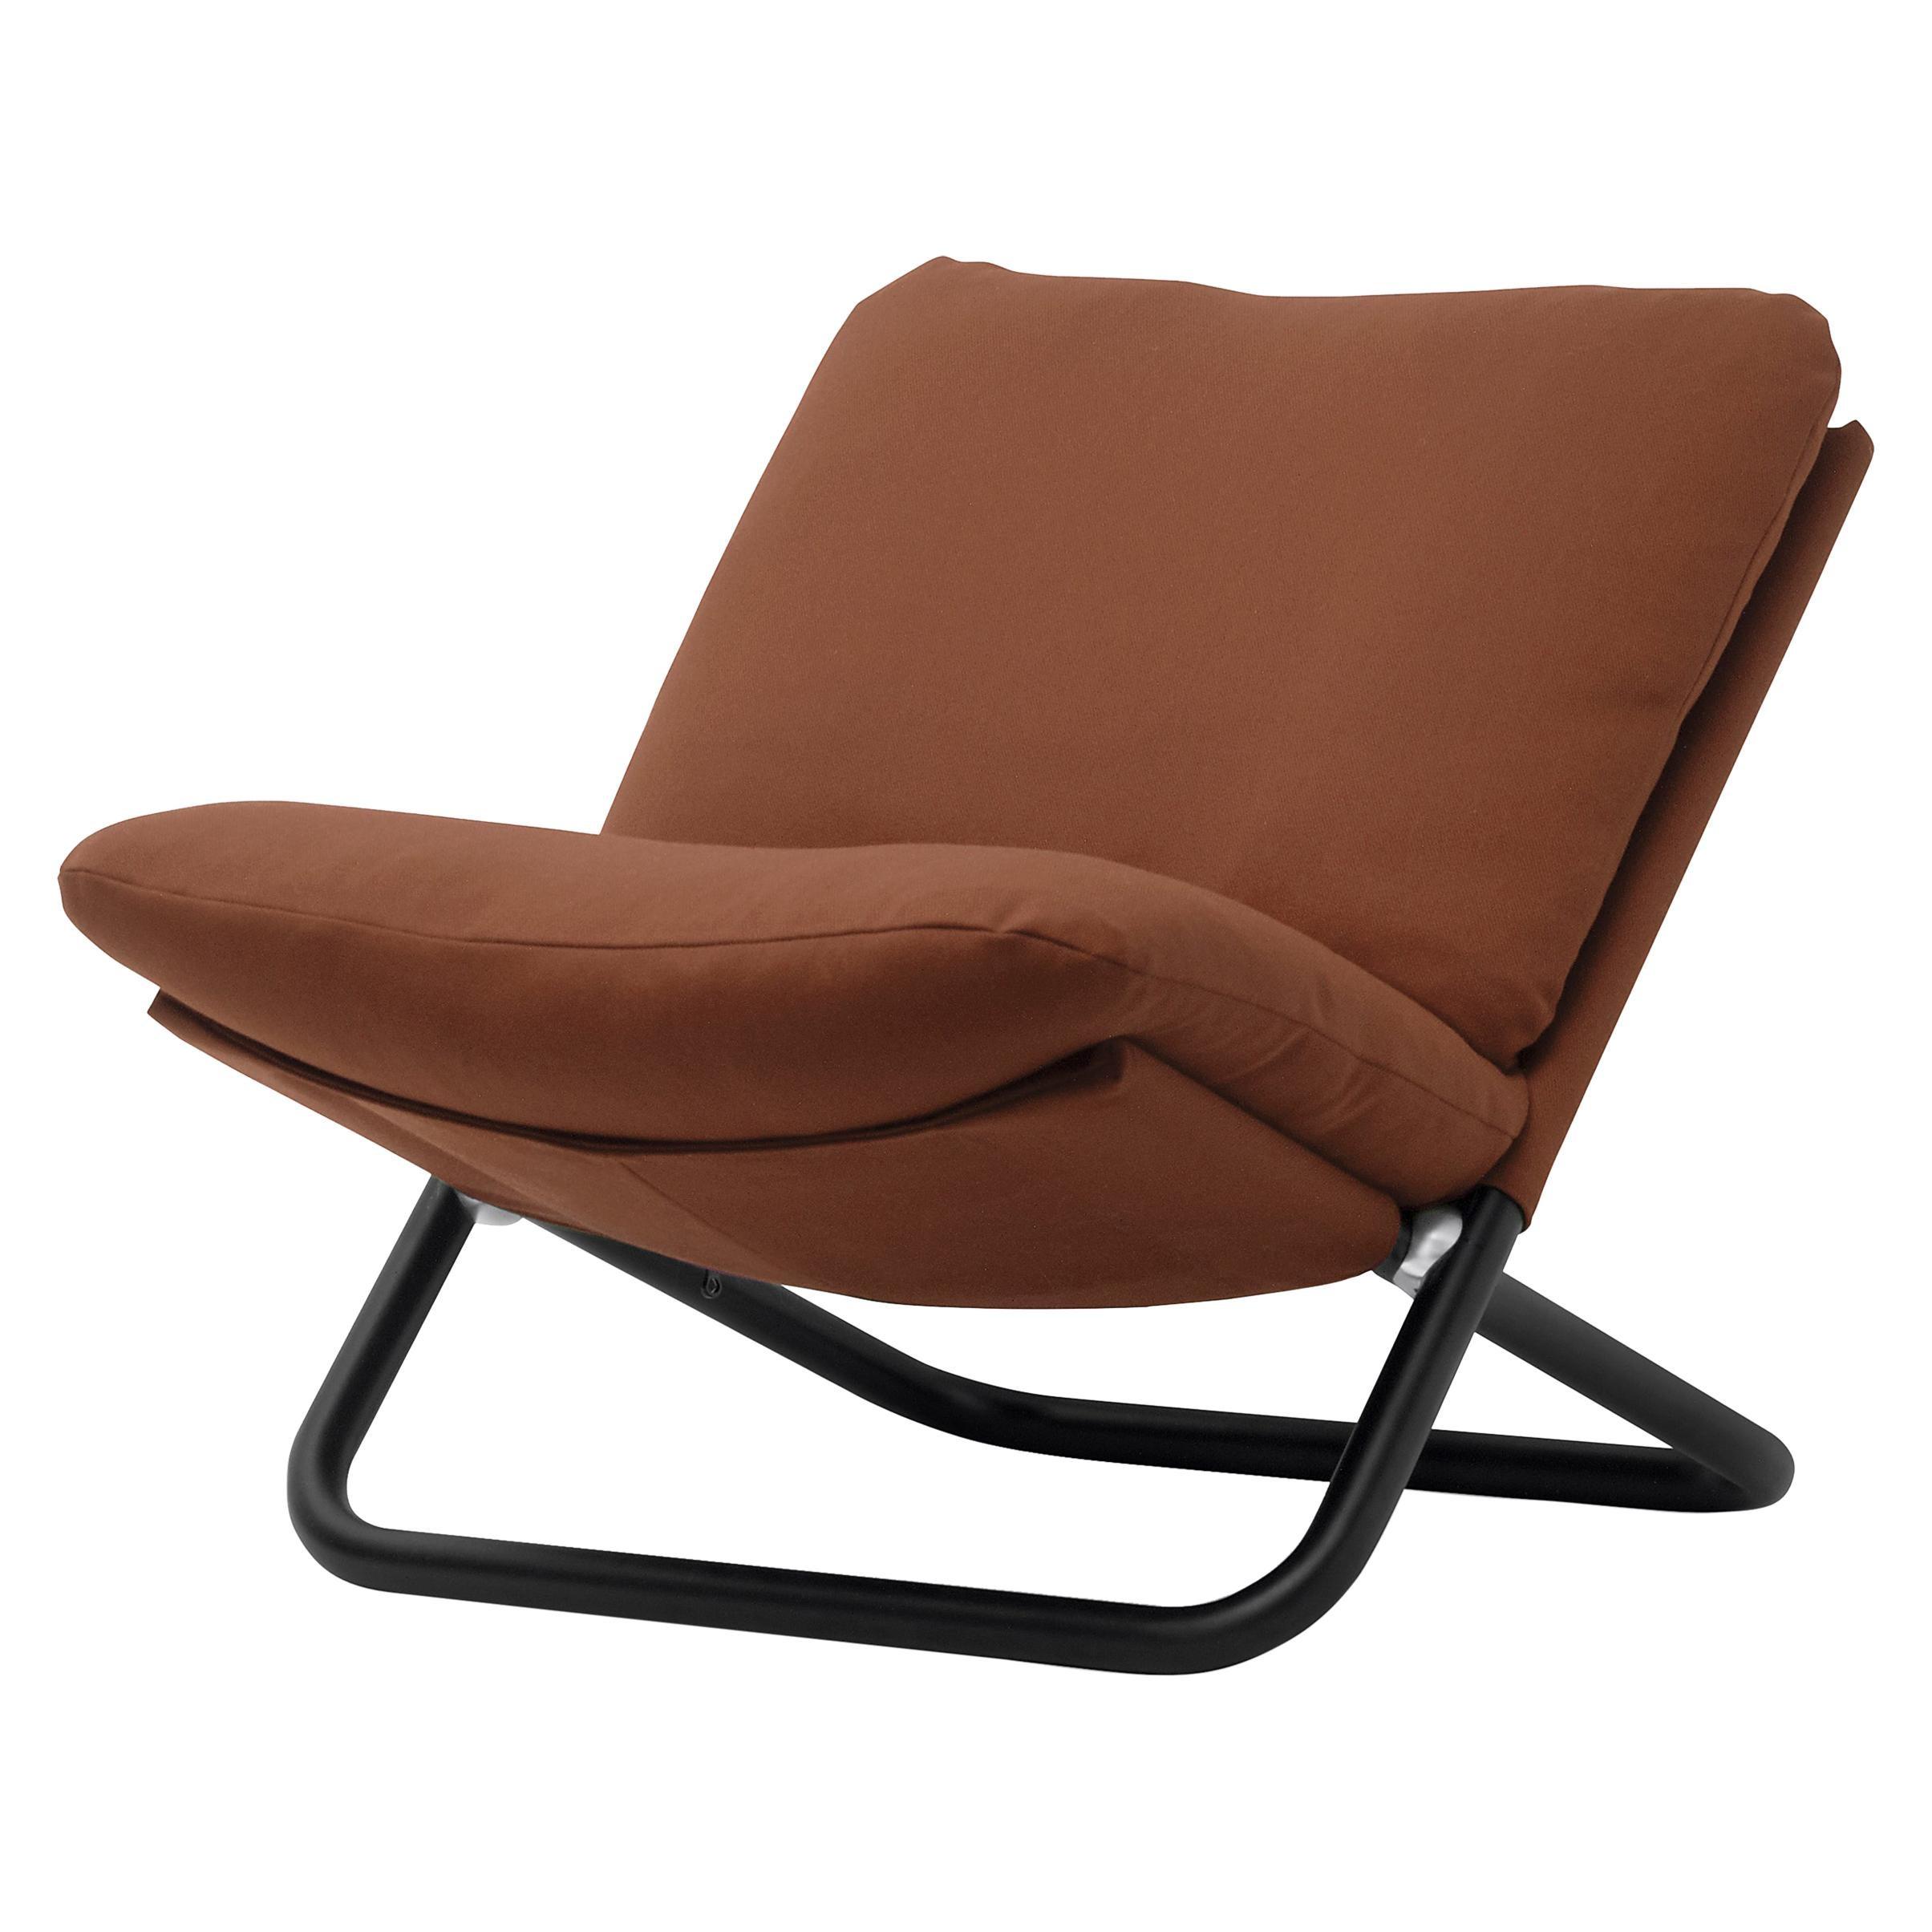 Arflex Cross Low Backrest Armchair in Brown Steelcut Fabric by Marcello Cuneo